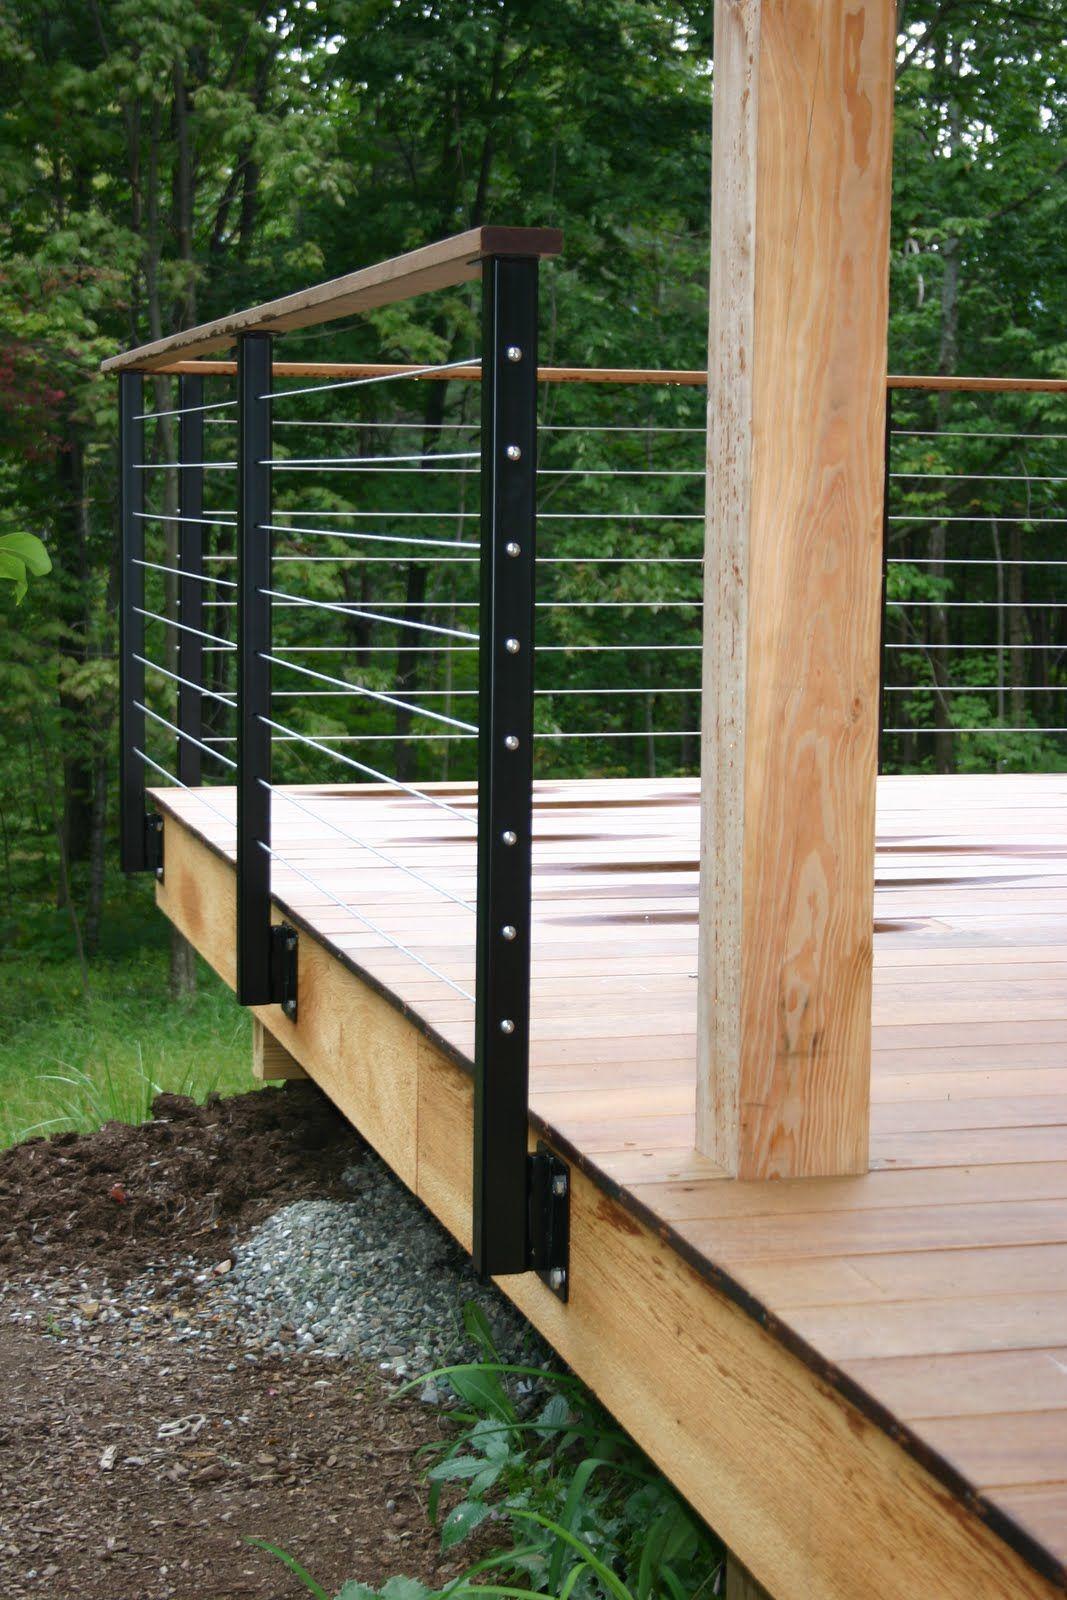 Deck Cable Railing Lattice Fence Style {..}Lattice Portion combined ...